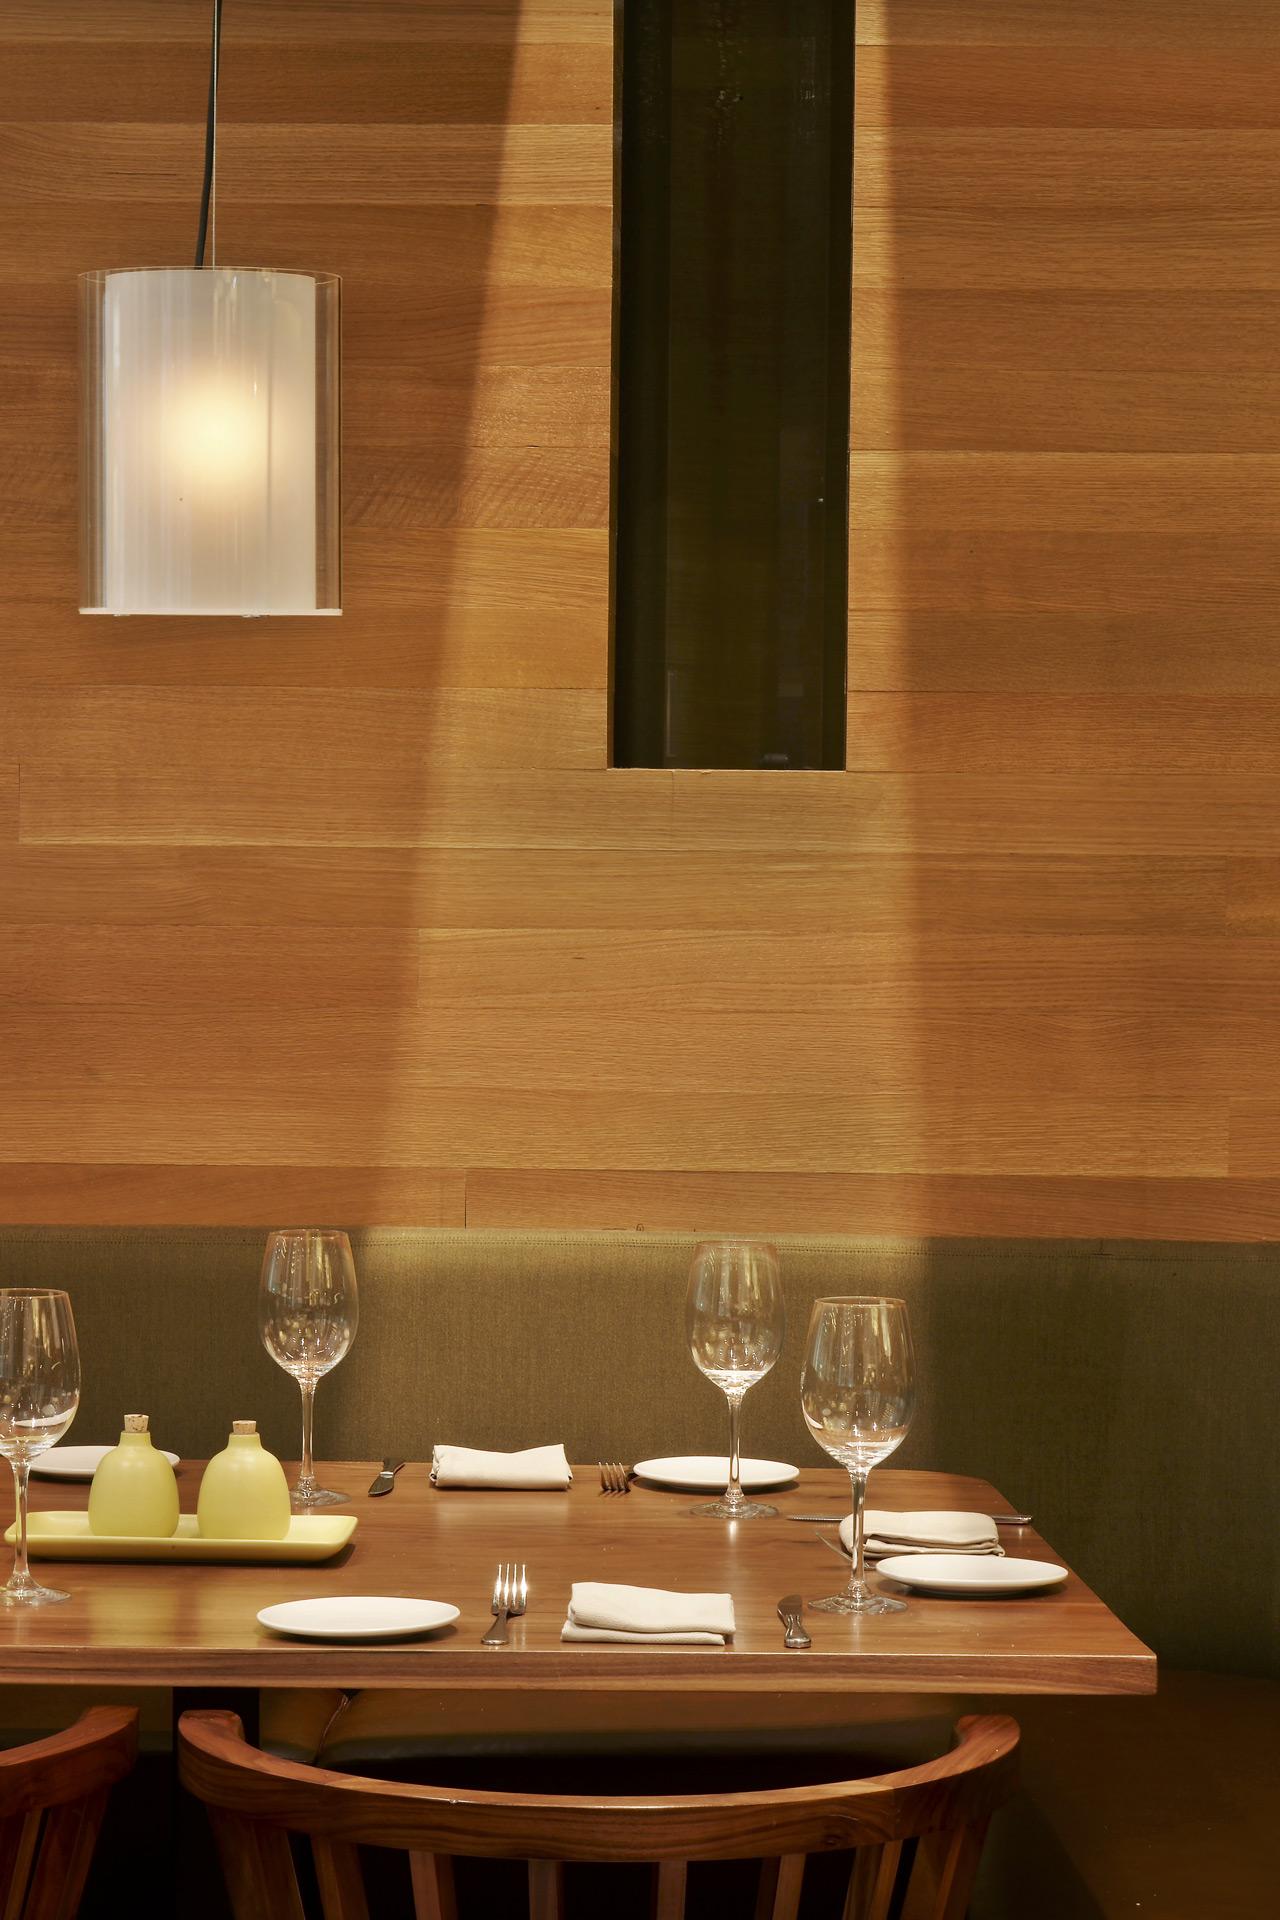 Sway restaurant interiors